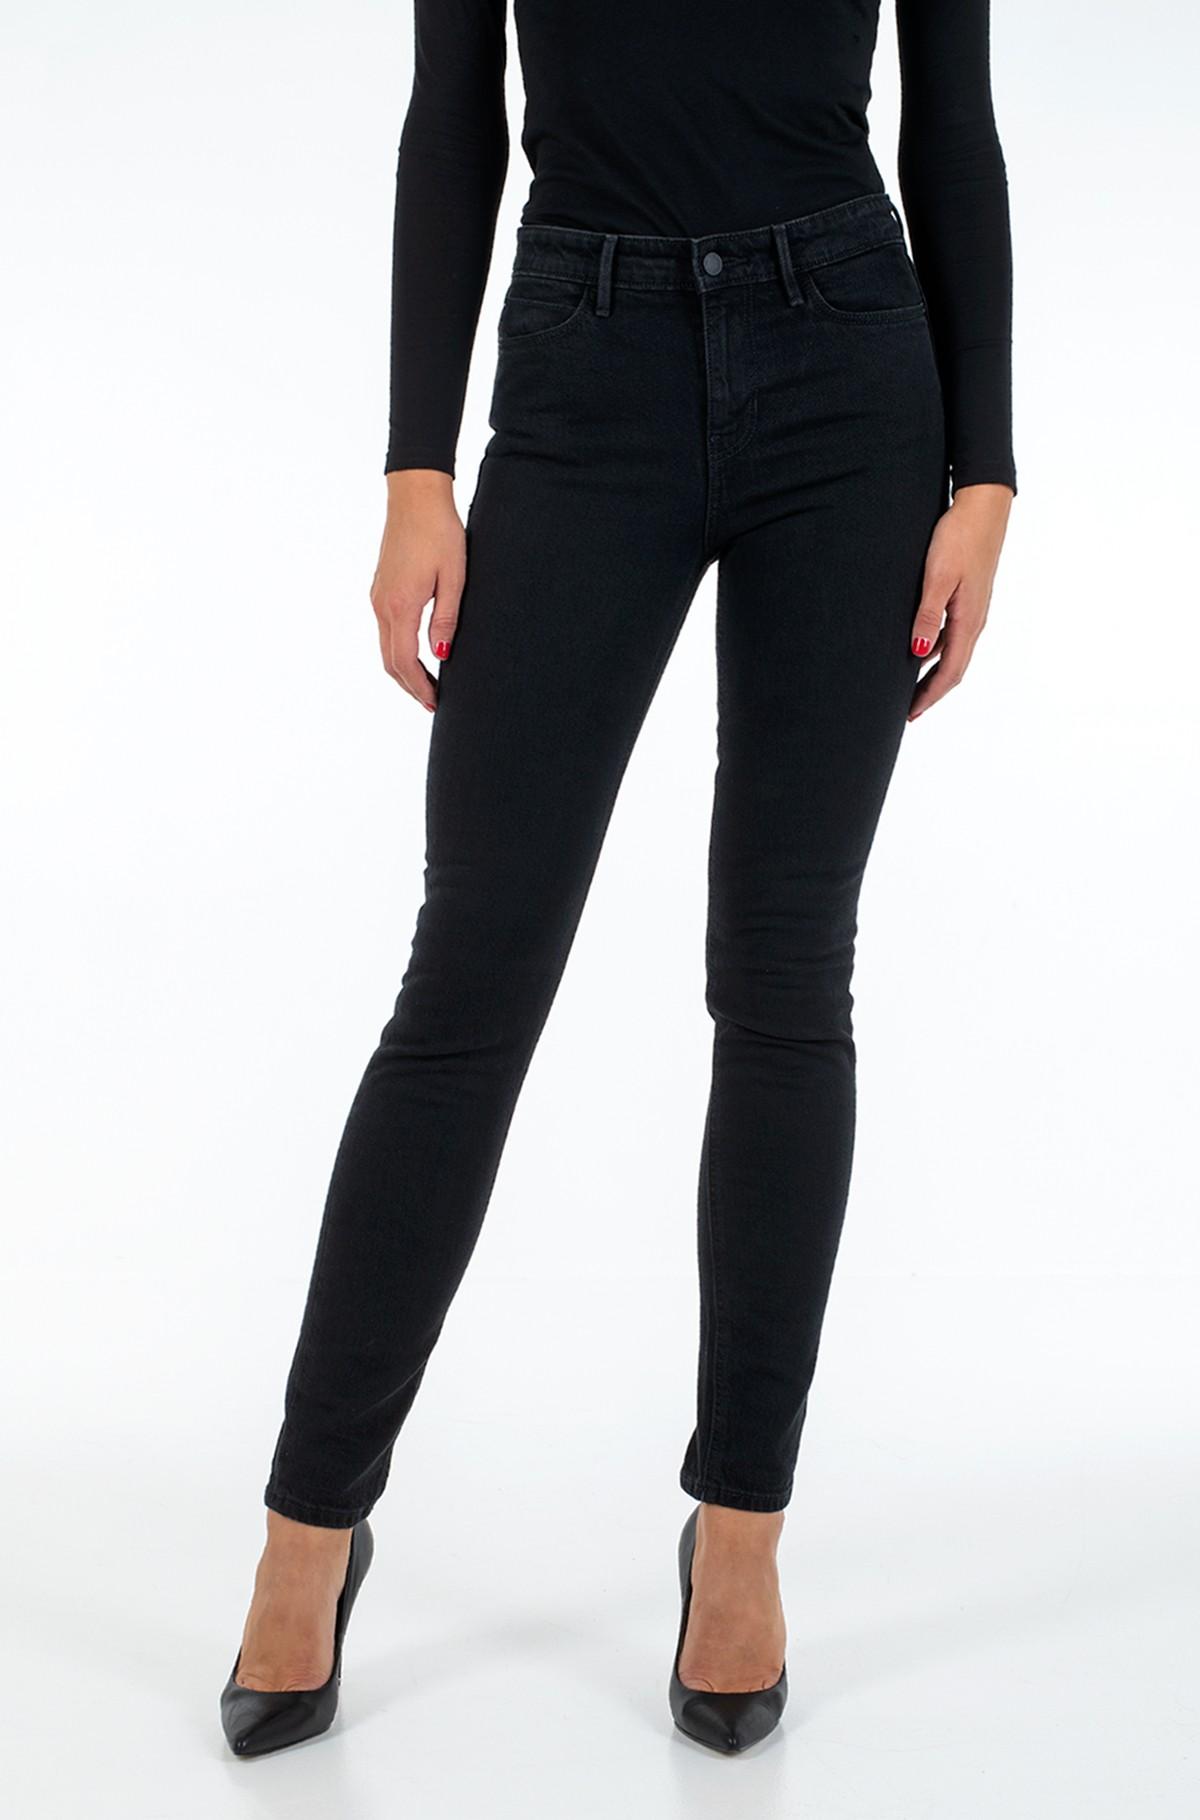 Jeans W0YA46 D3Y26-full-1